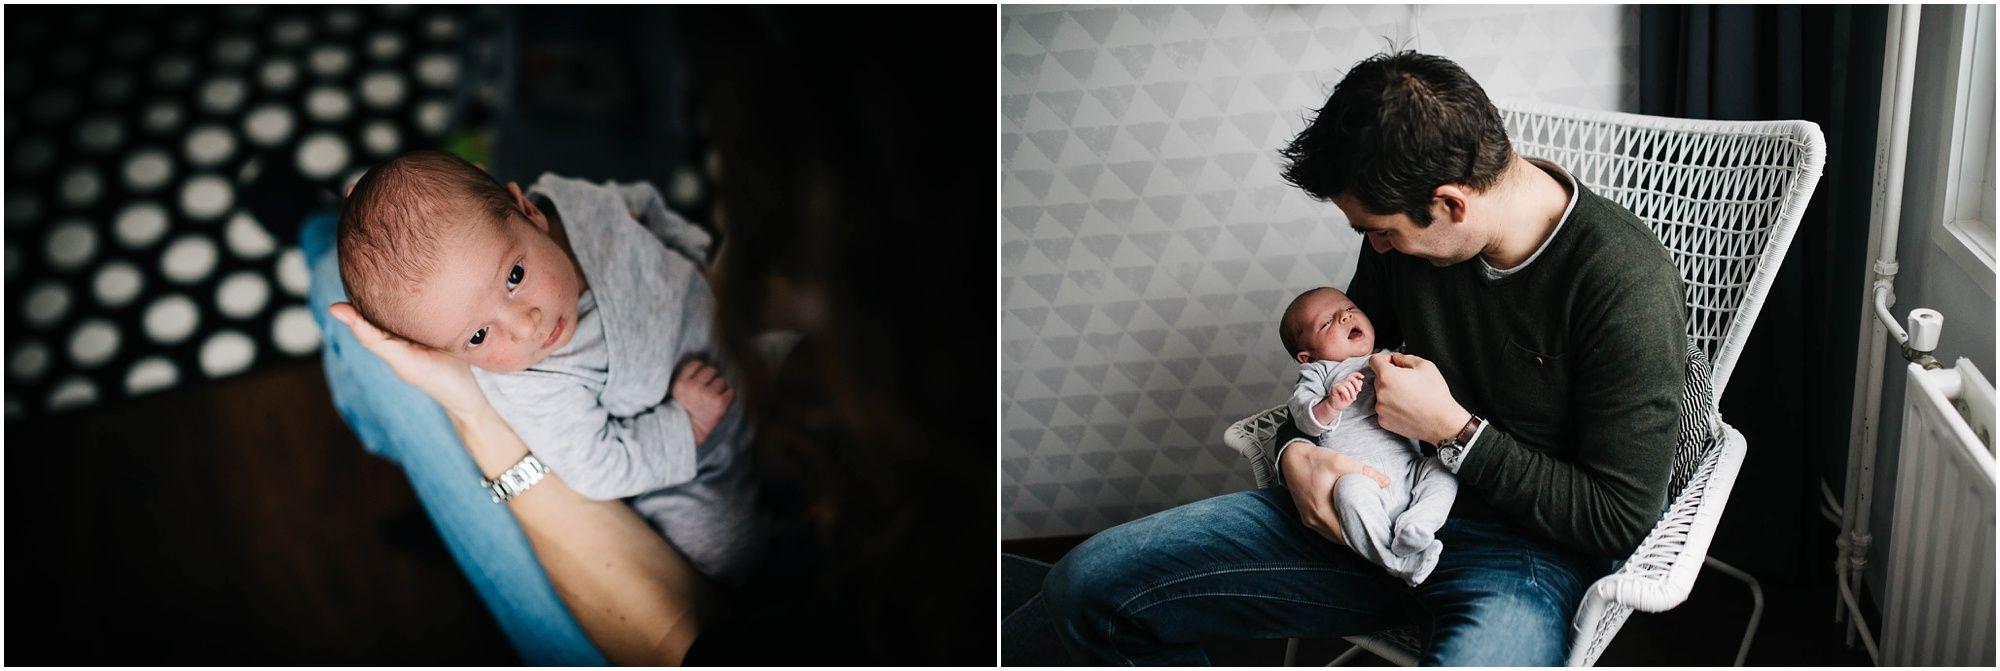 Lifestyle newbornfotoshoot Den Bosch ongedwongen newbornfotografie